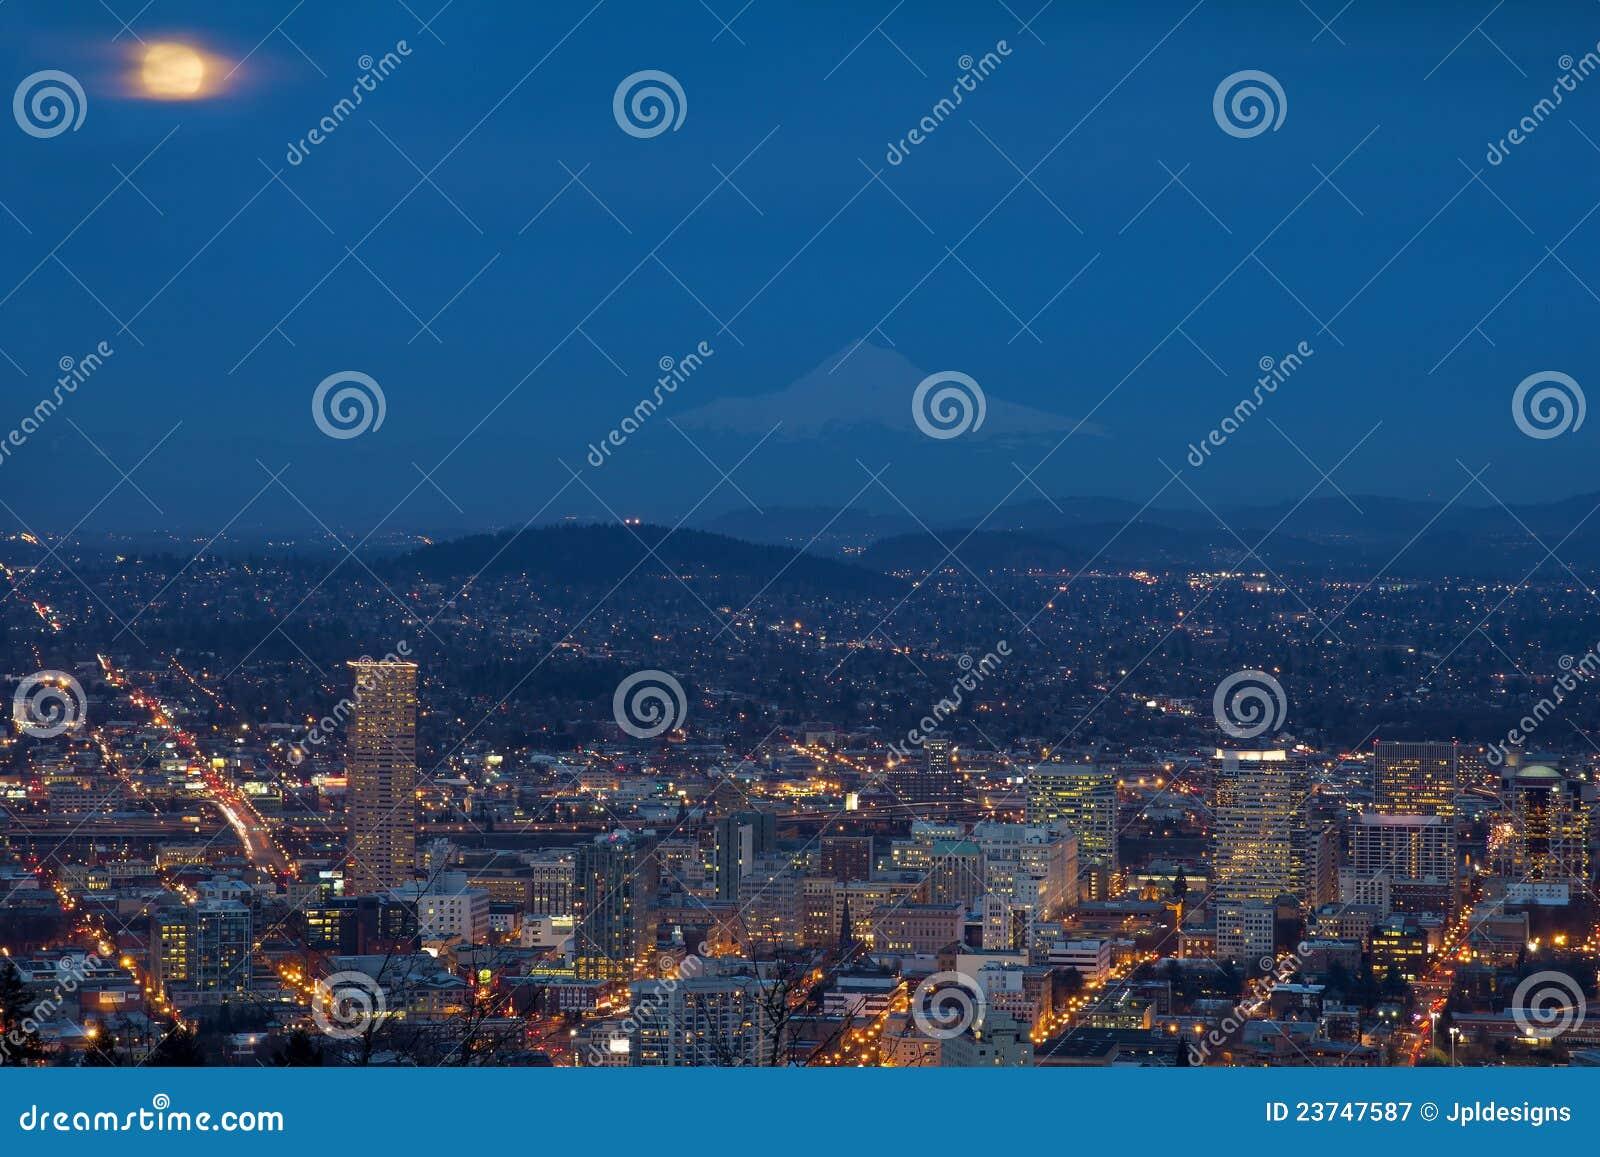 blue moon photography portland oregon - photo #6